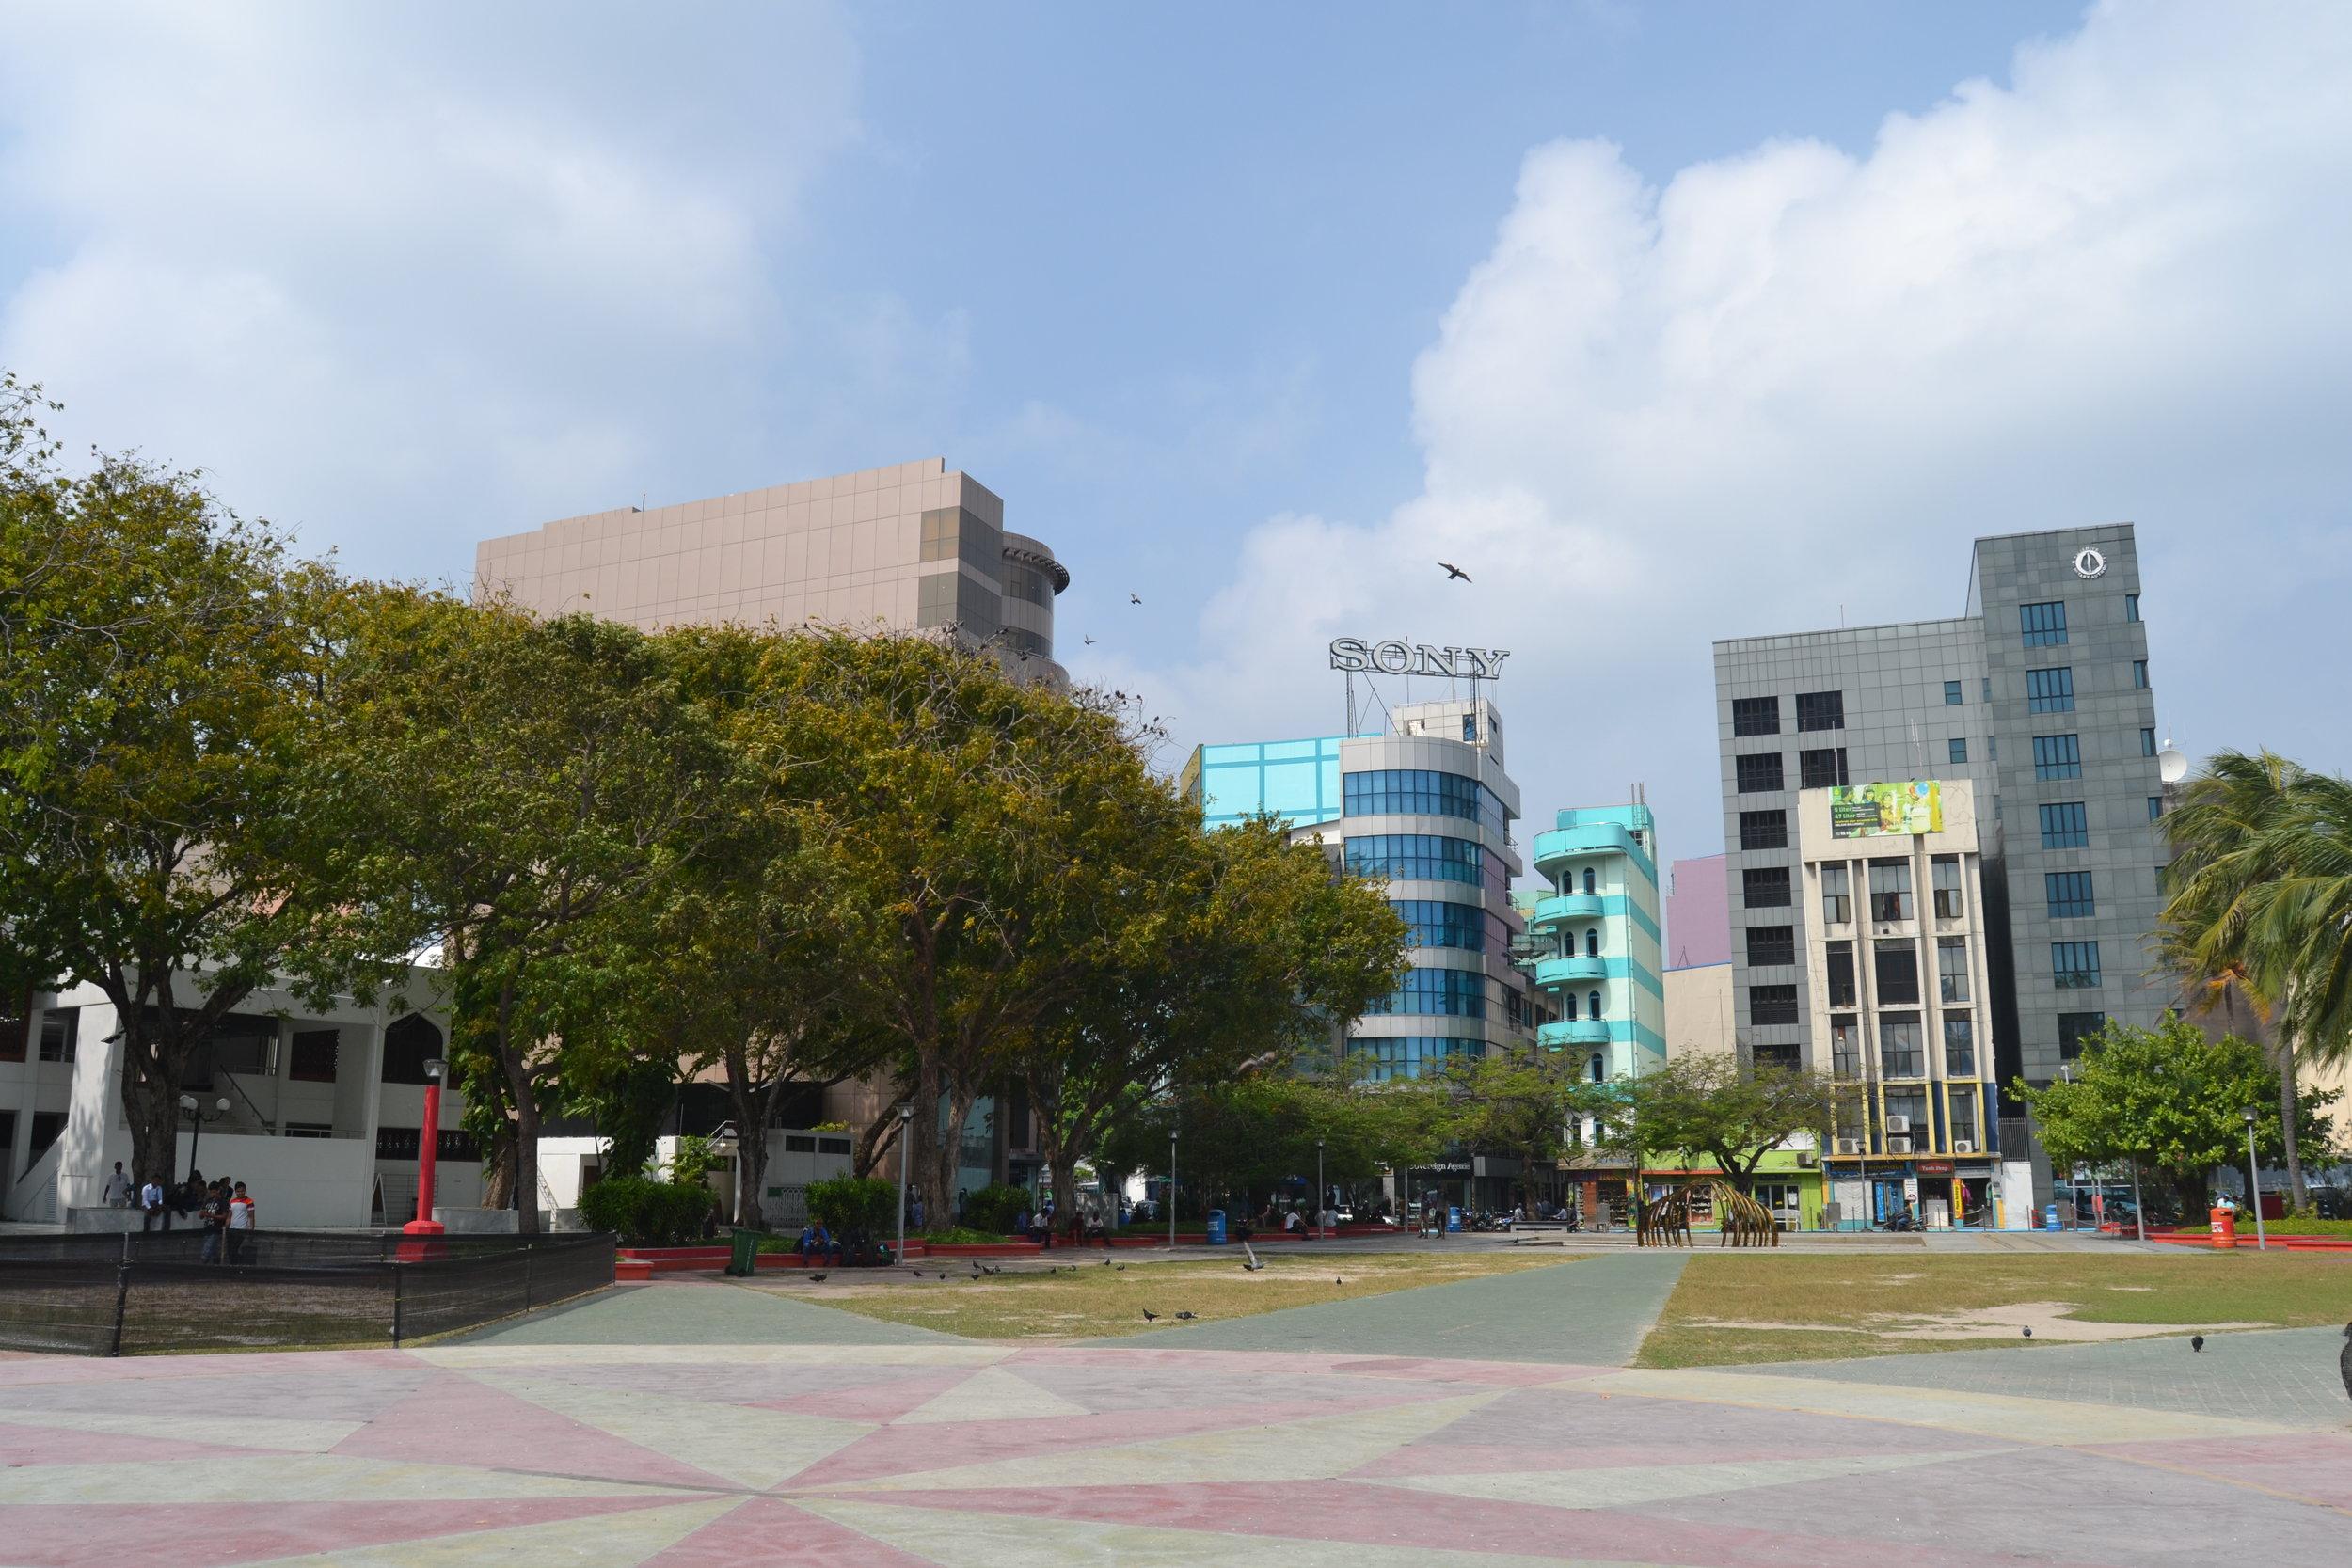 View of Republic Square